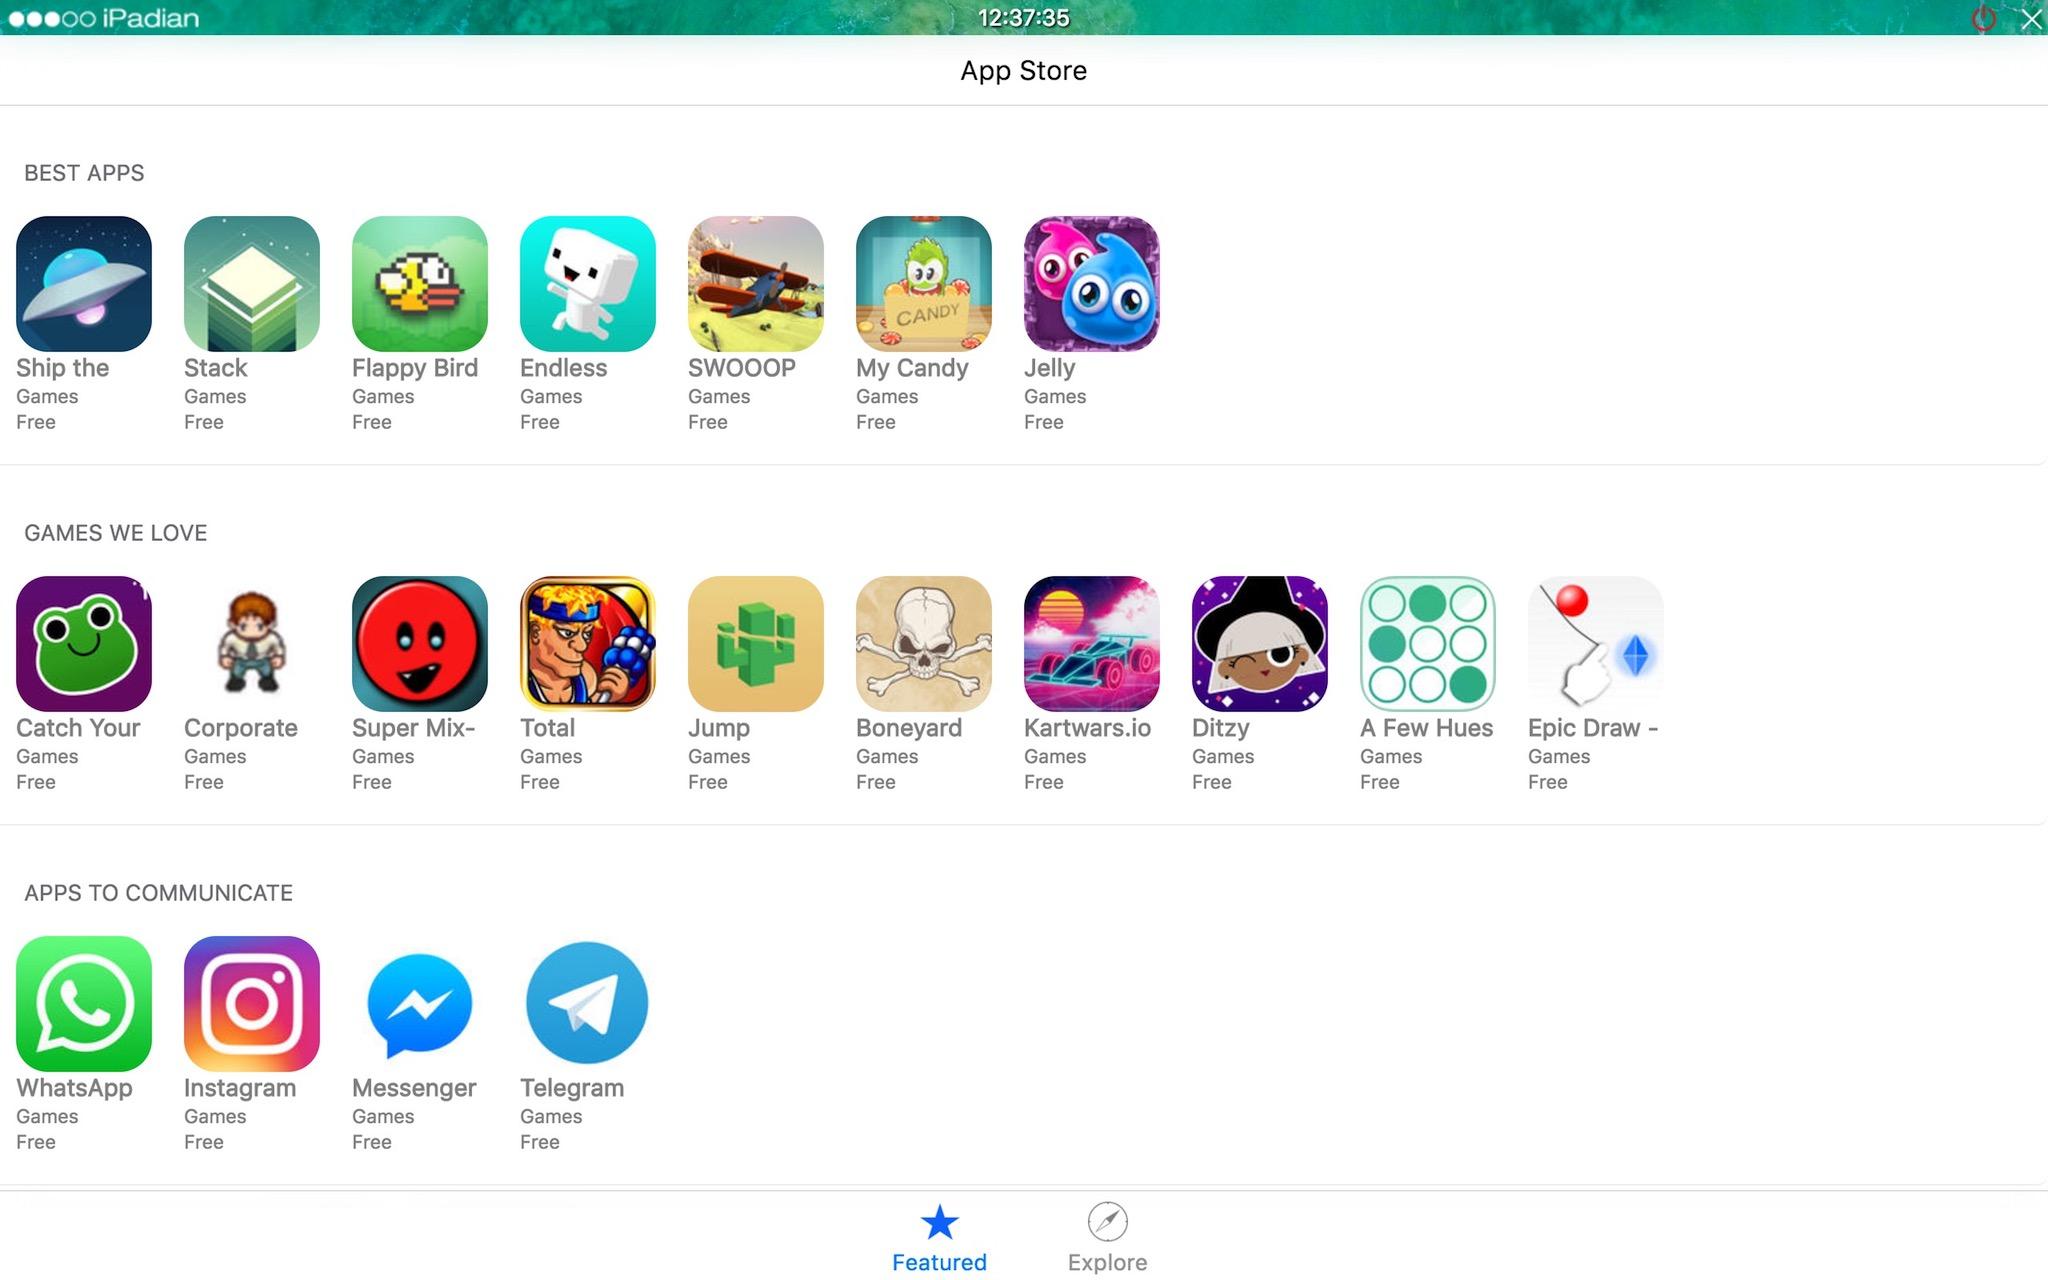 Cài đặt iMessage trên iPadian